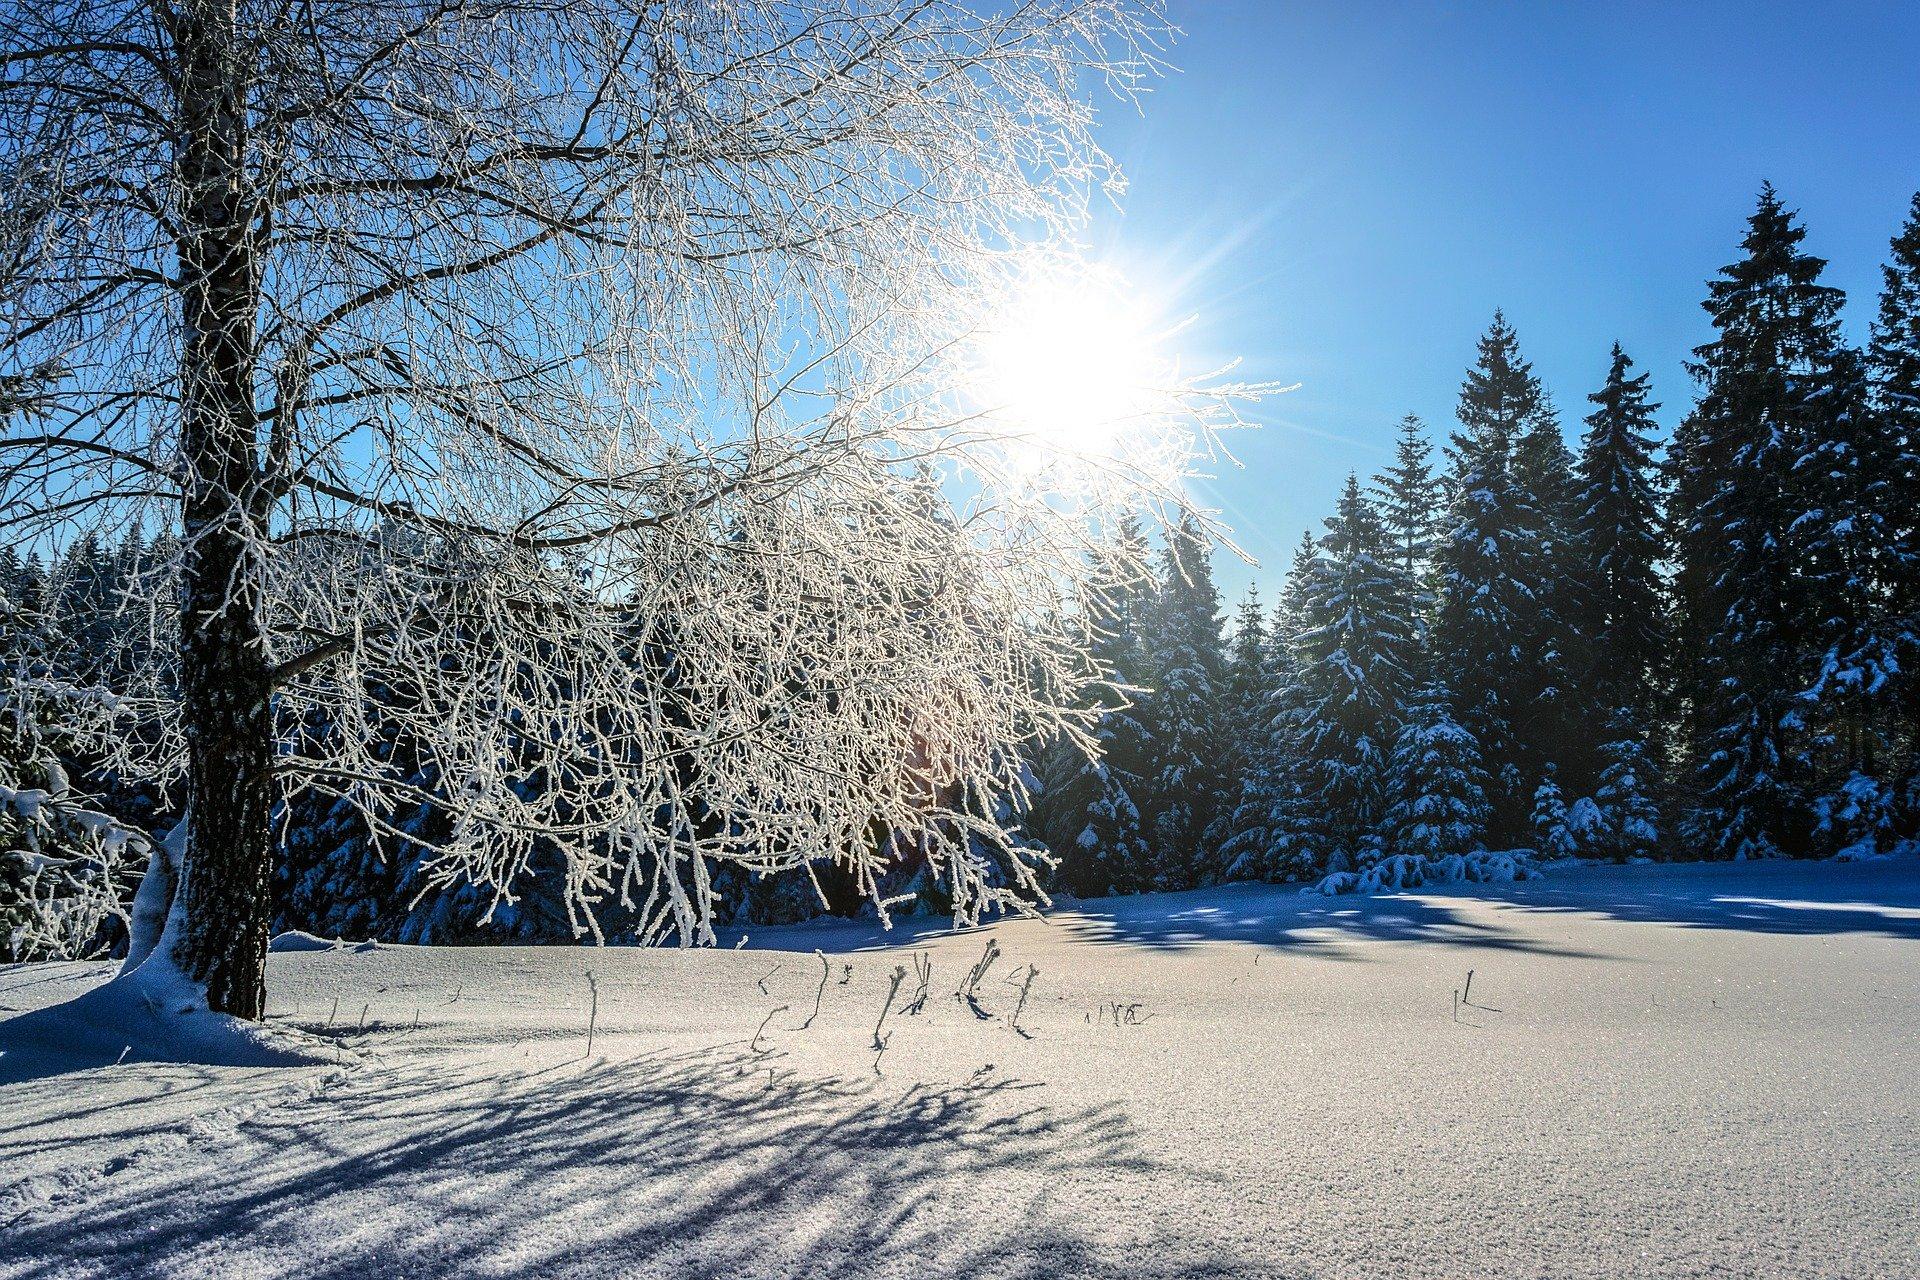 snow-3157317_1920